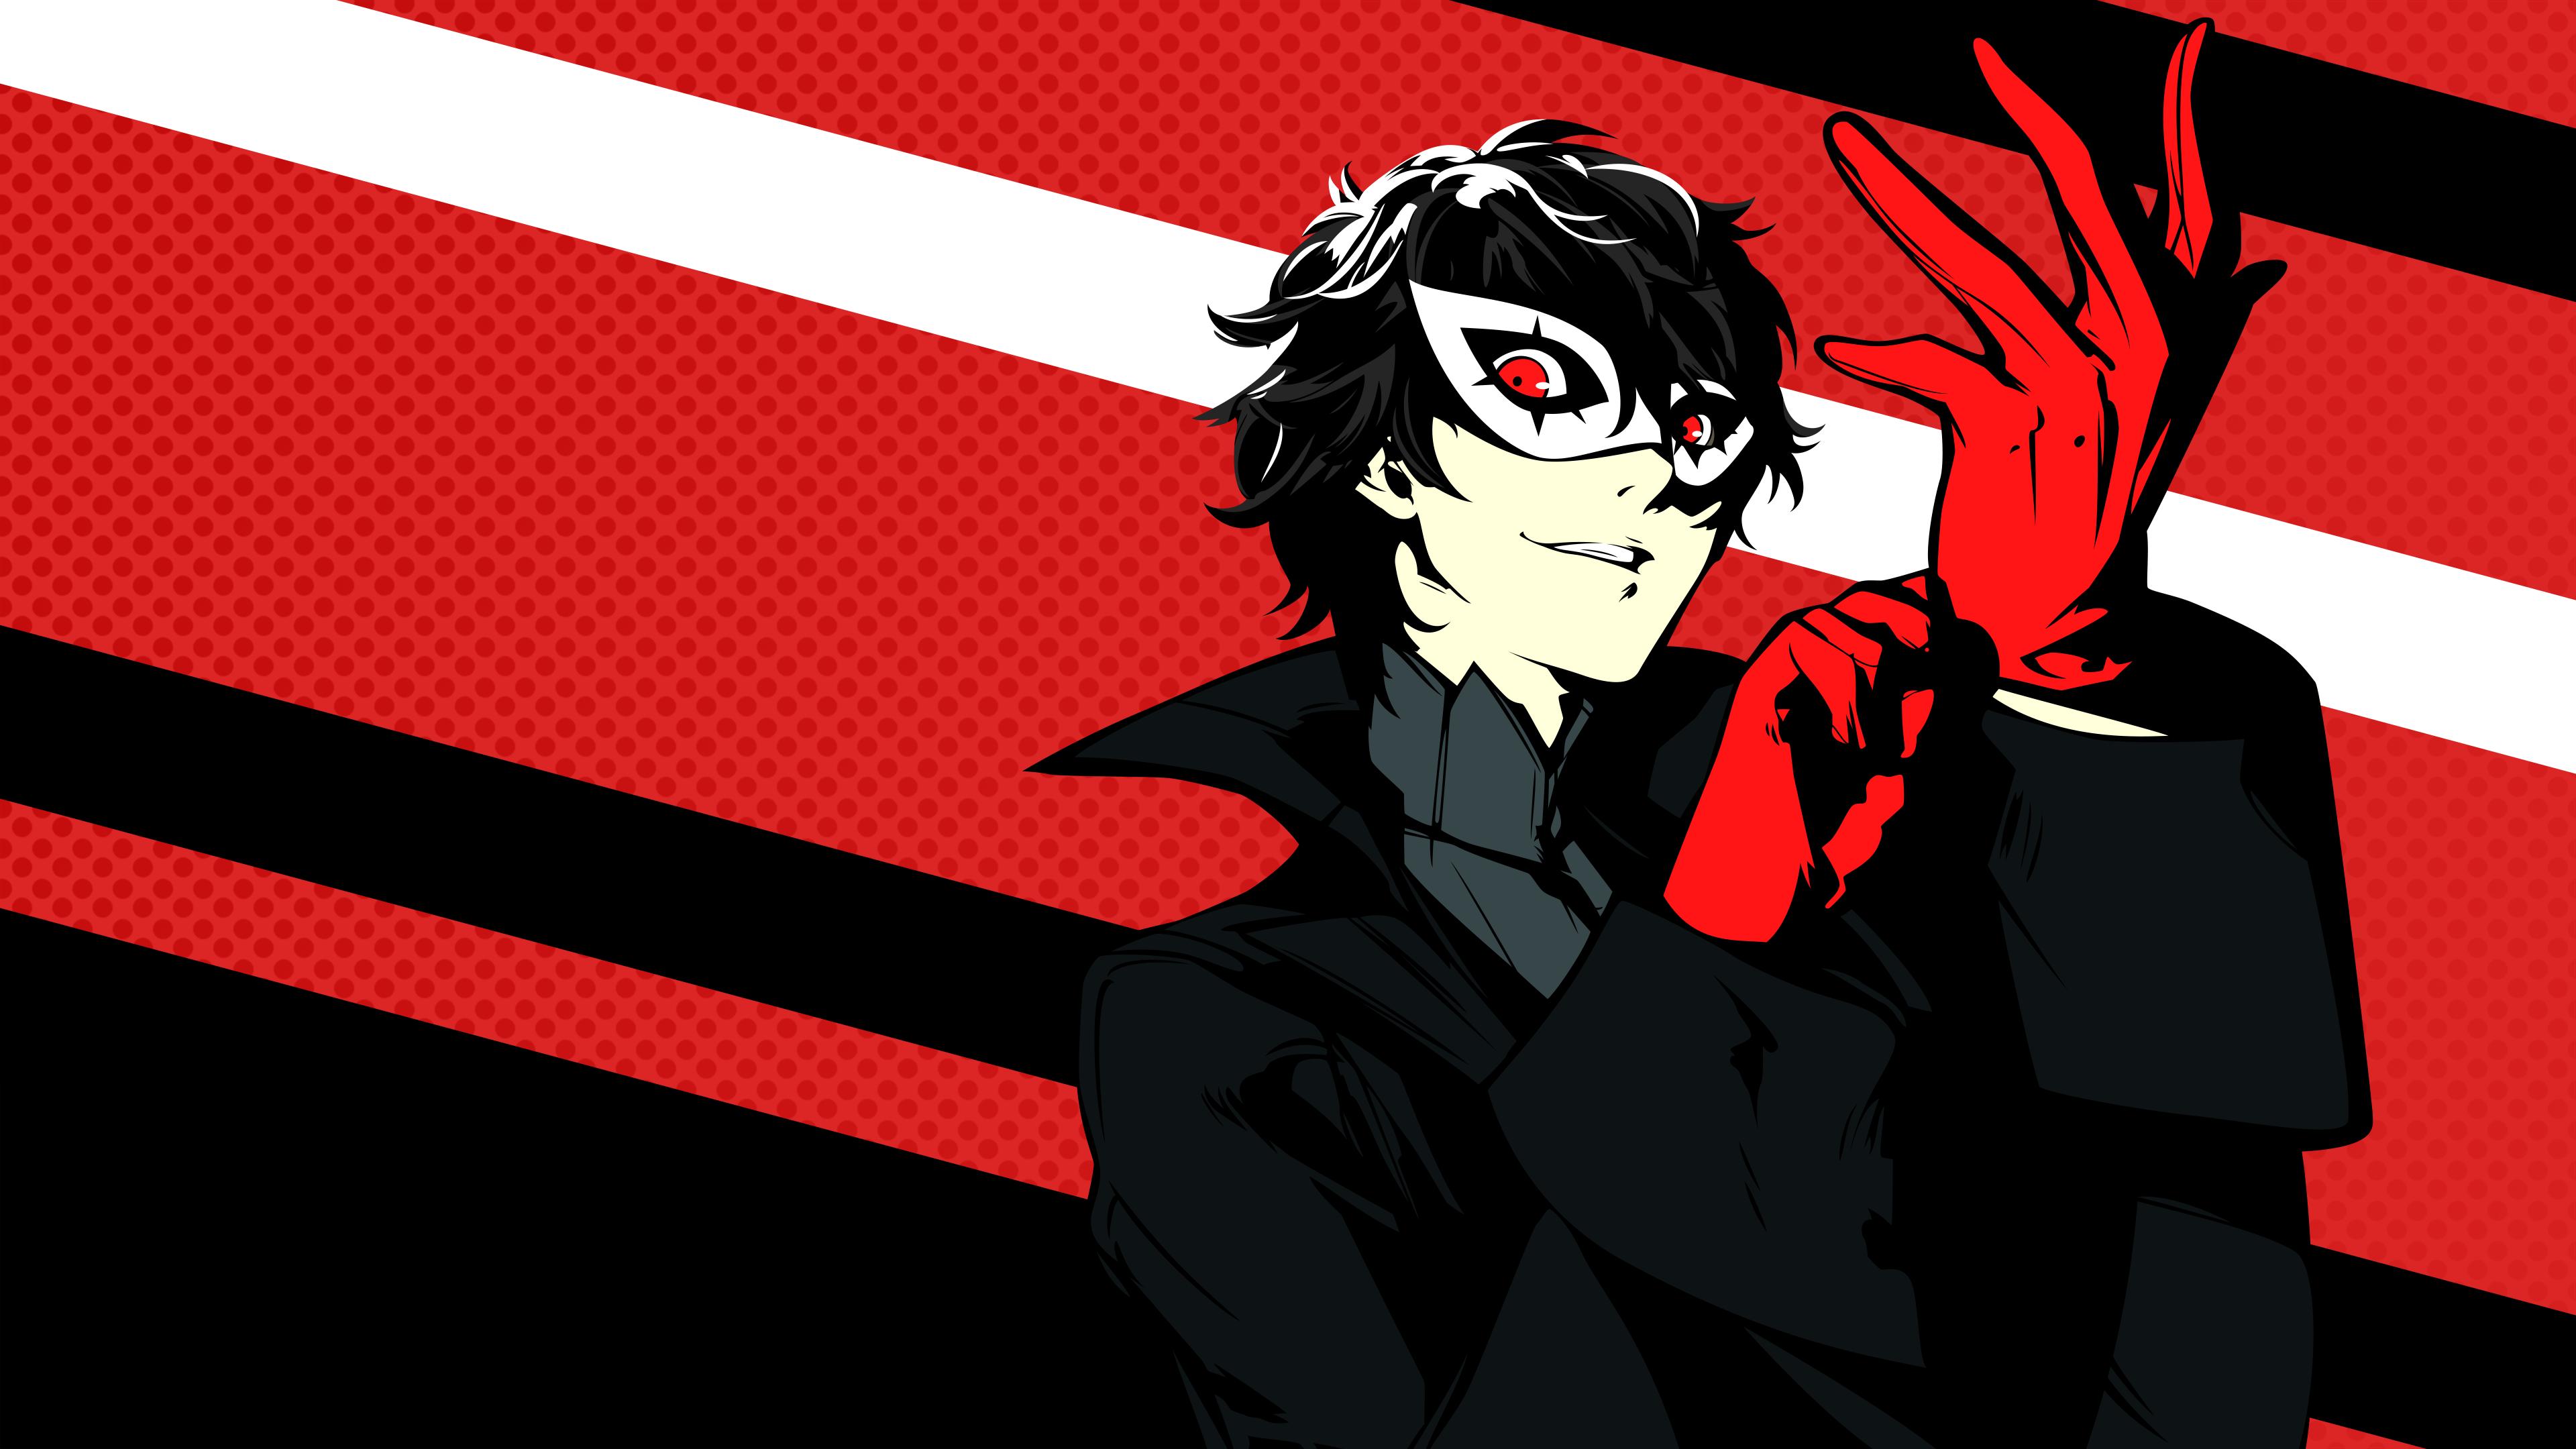 Joker Wallpaper By Dekodere On Deviantart Persona 5 Joker Persona 5 Anime Joker Wallpapers